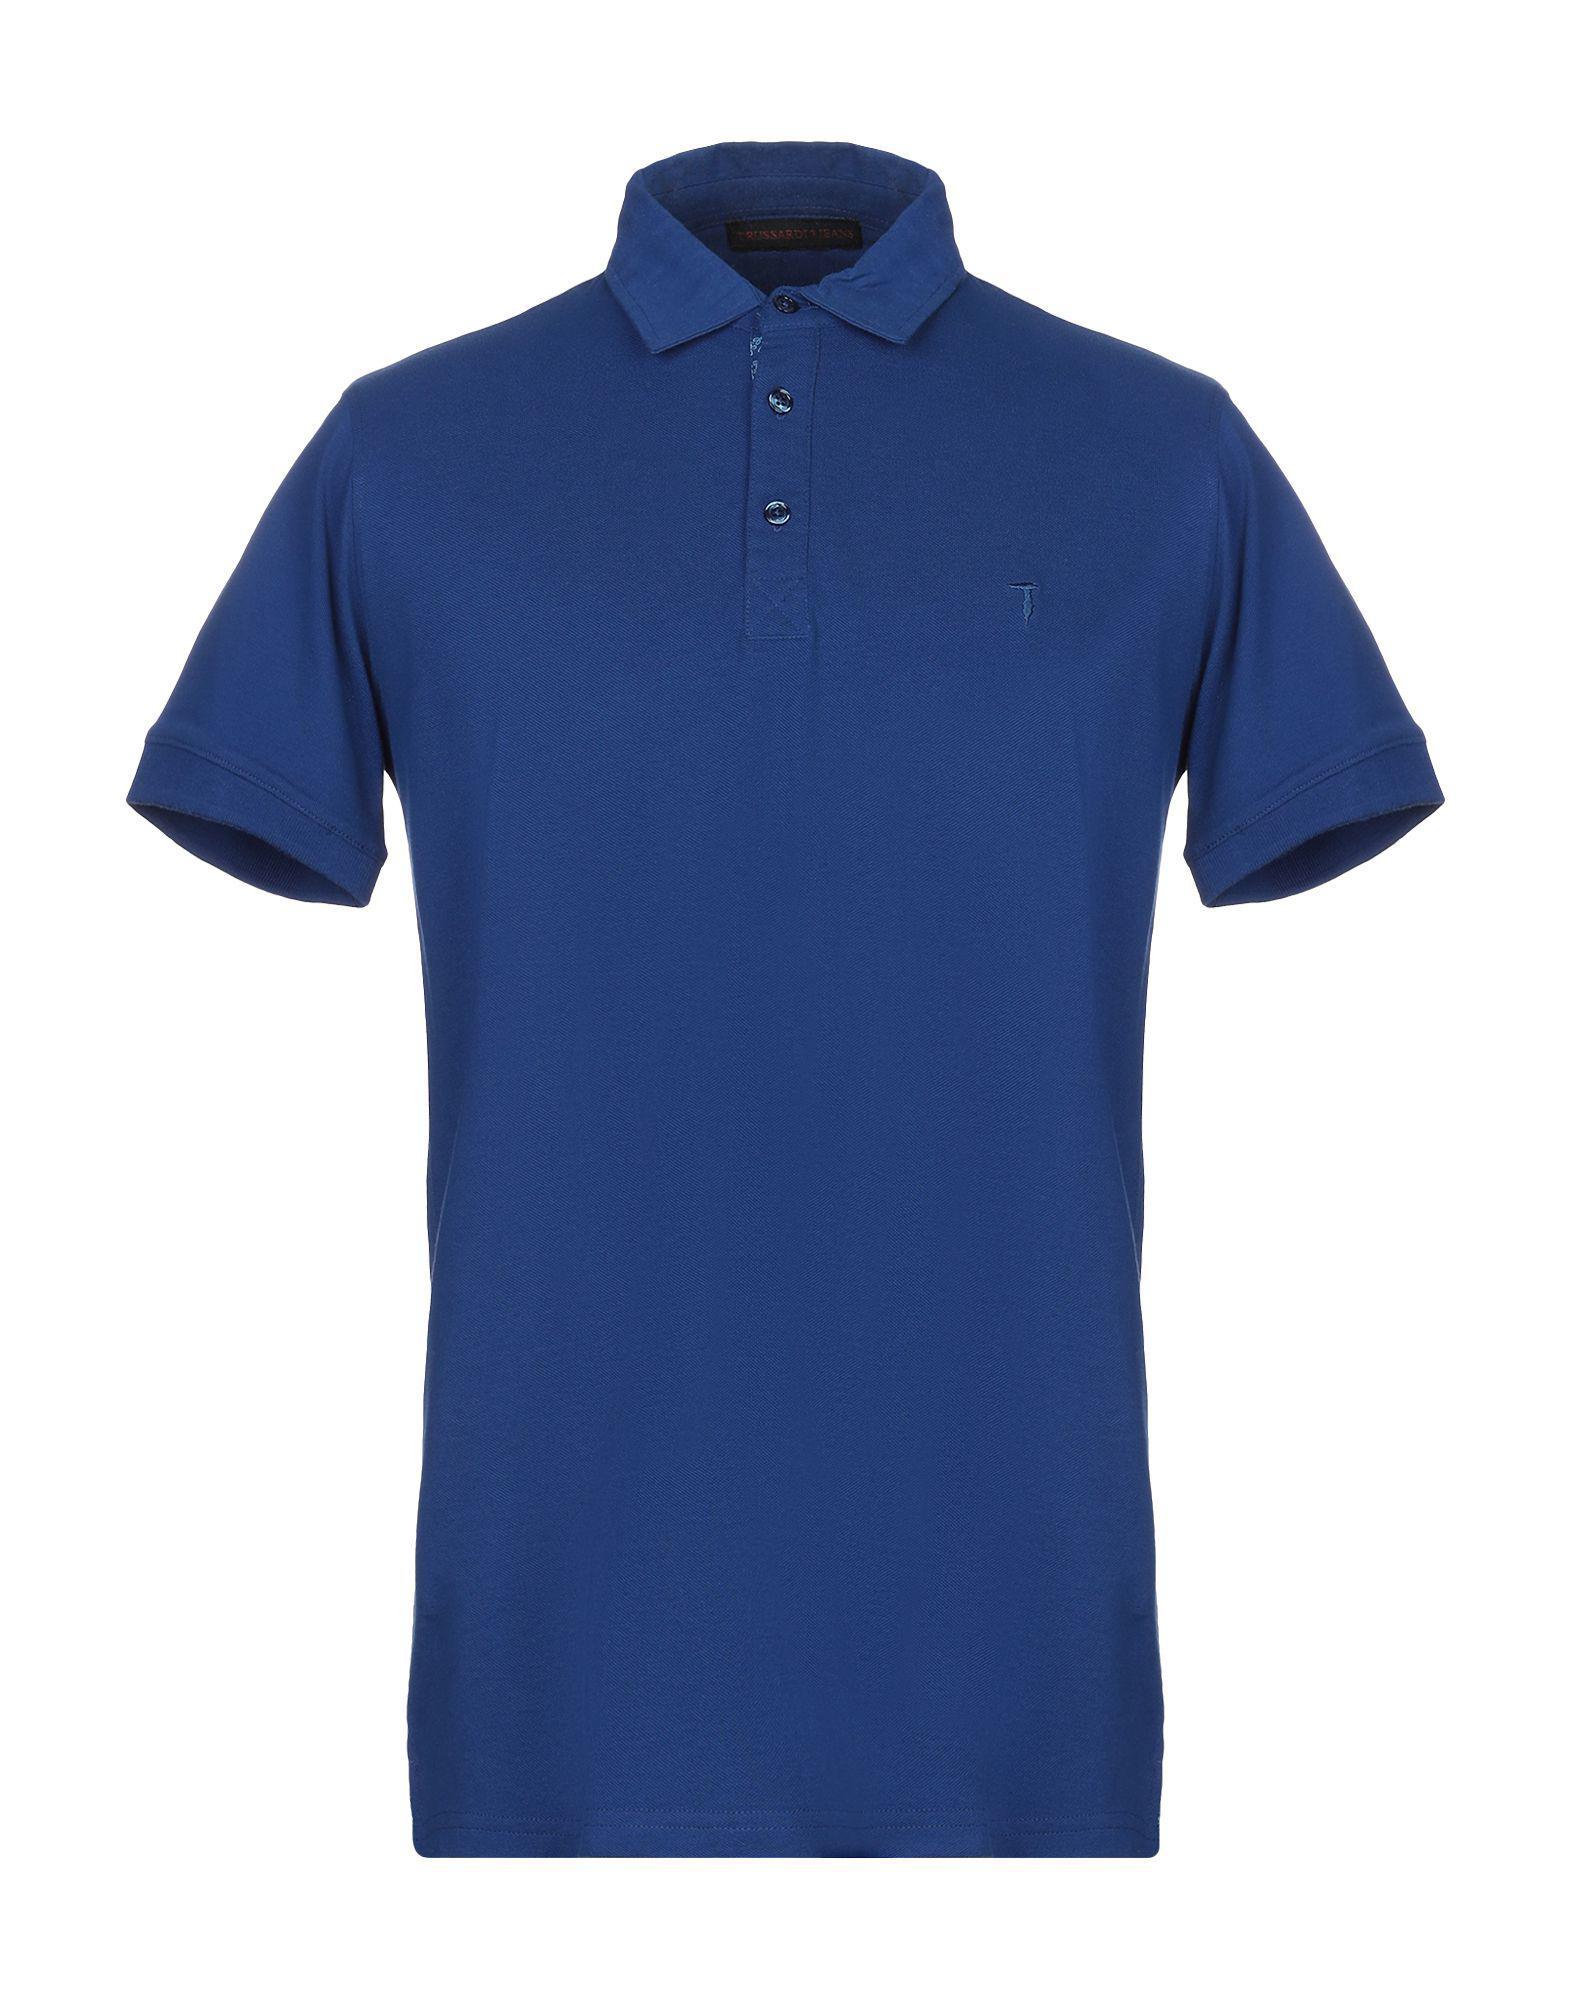 92e2433c1c5d Lyst - Trussardi Polo Shirt in Blue for Men